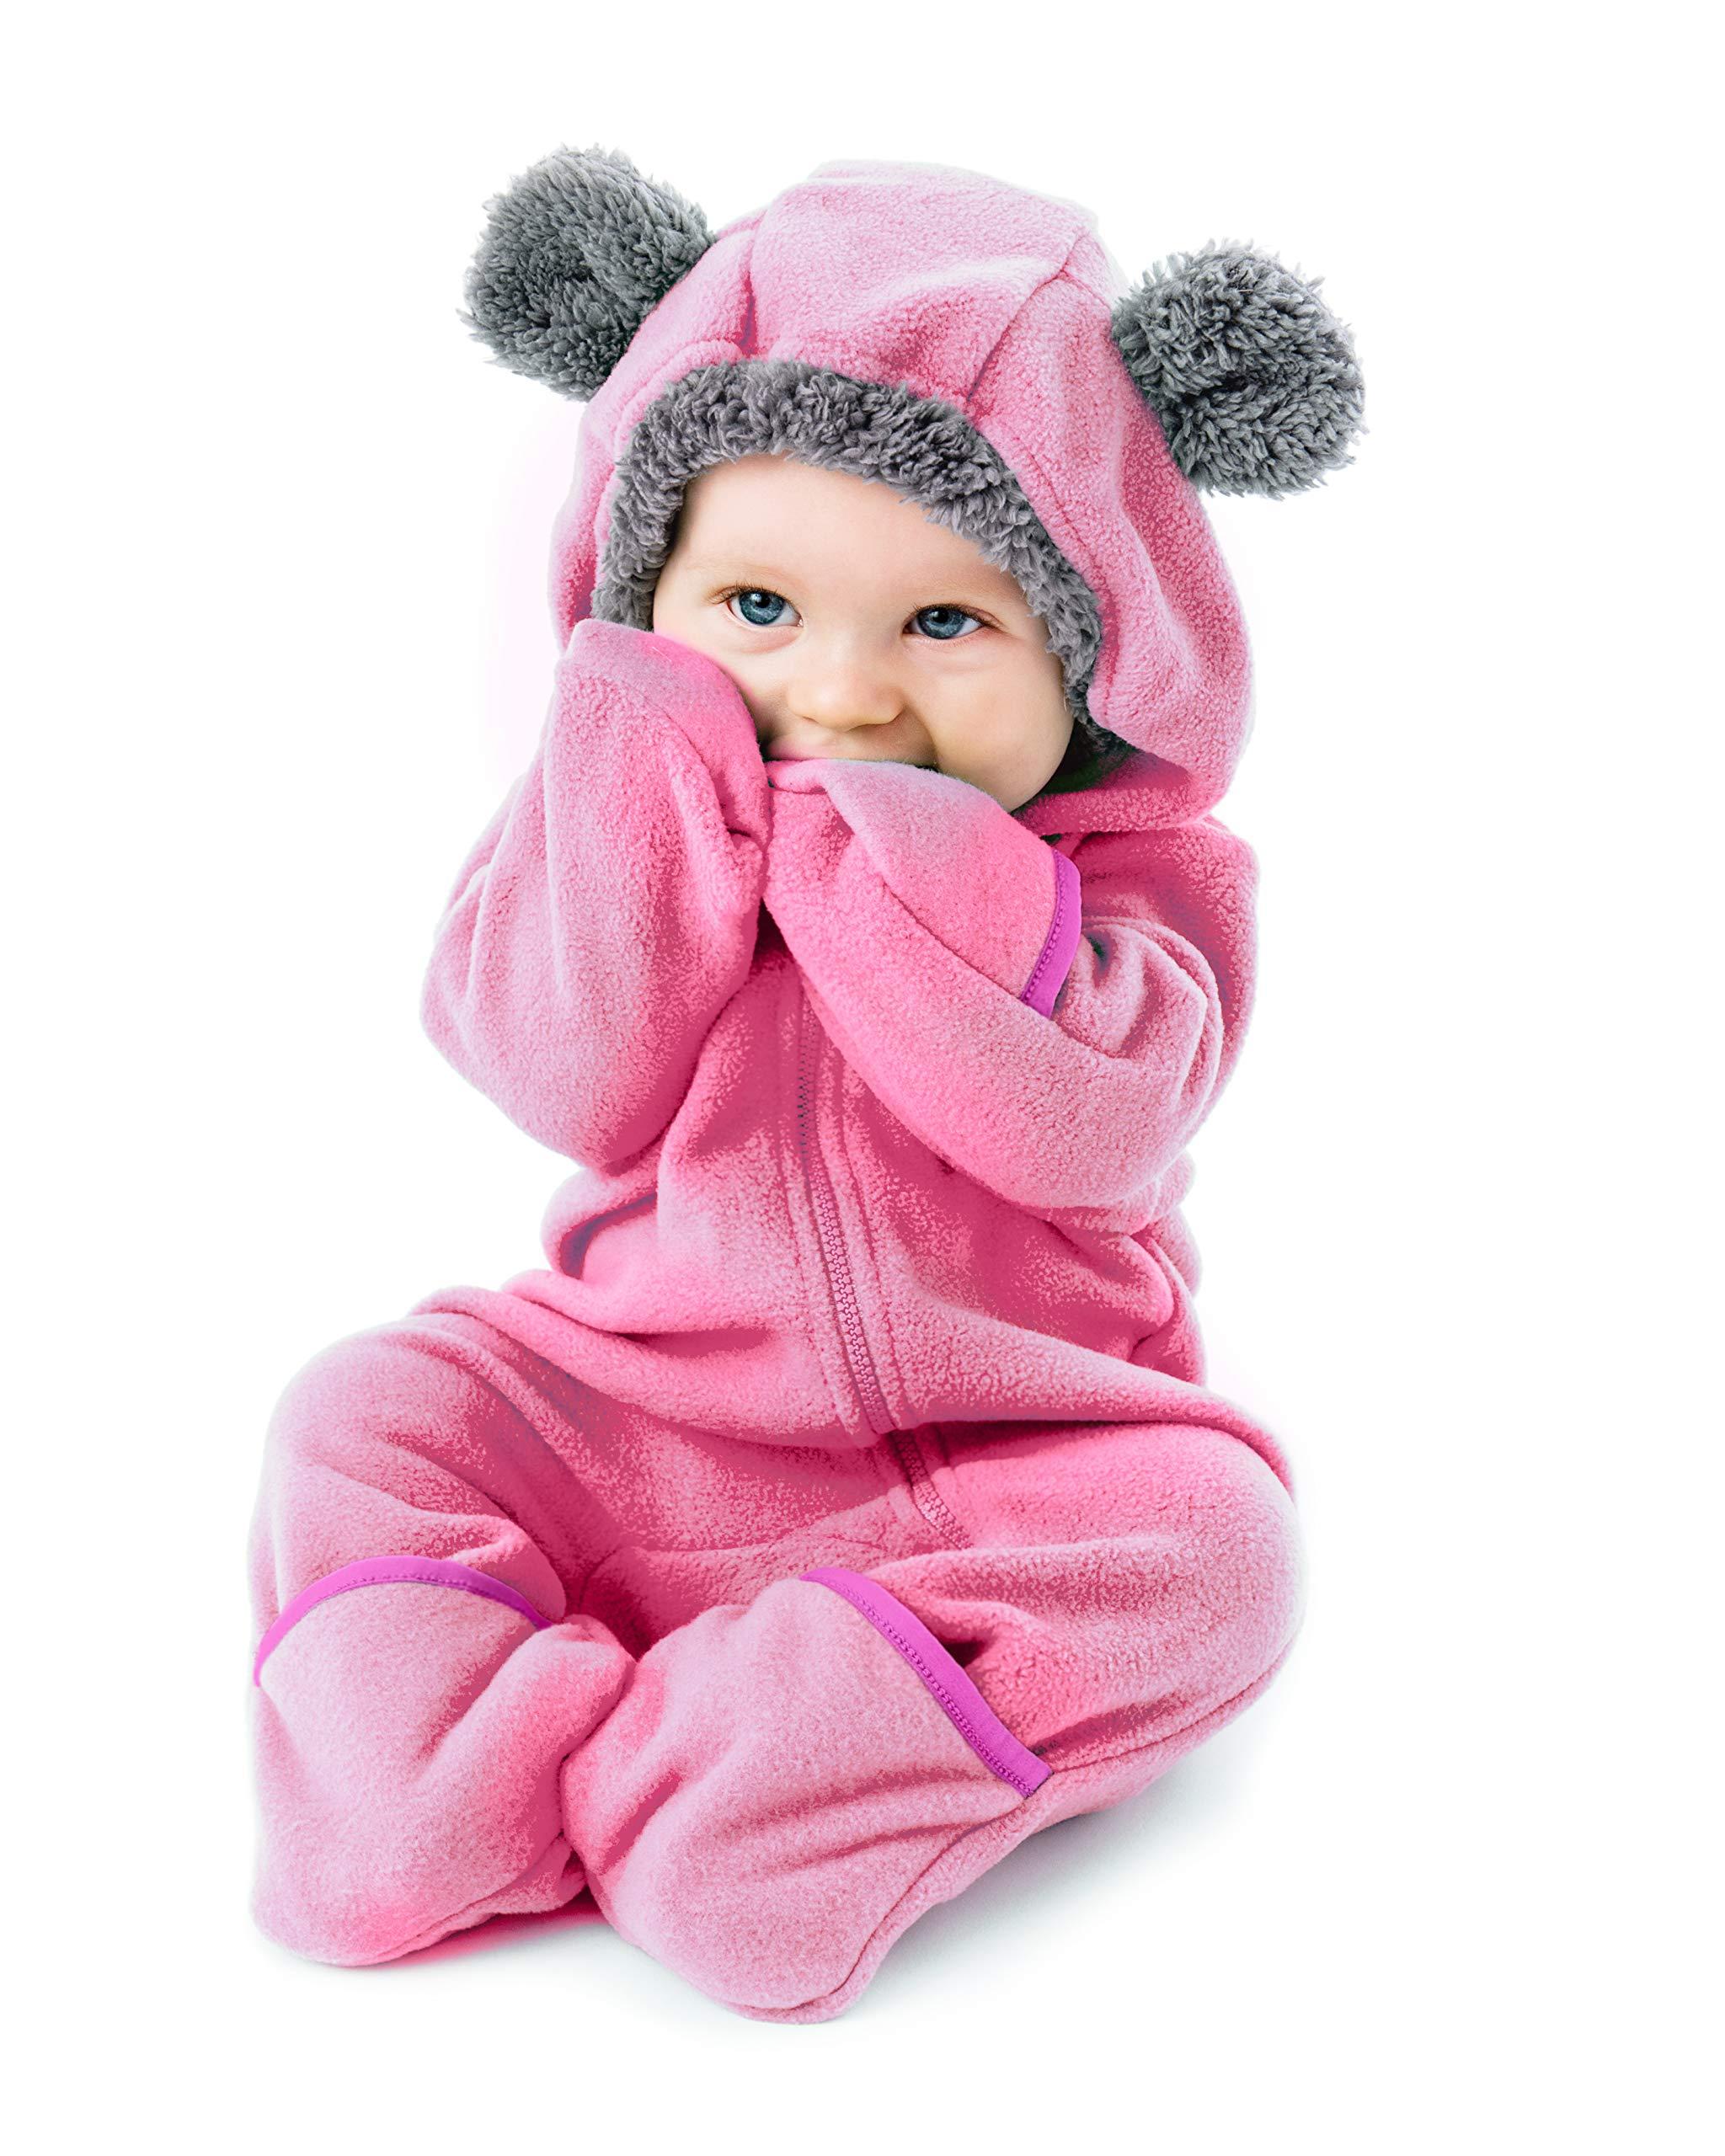 UNIQUEONE Infant Winter Snowsuit Baby Bear Outfit Fleece Bunting Pram Suit Outerwear Coat with Ears